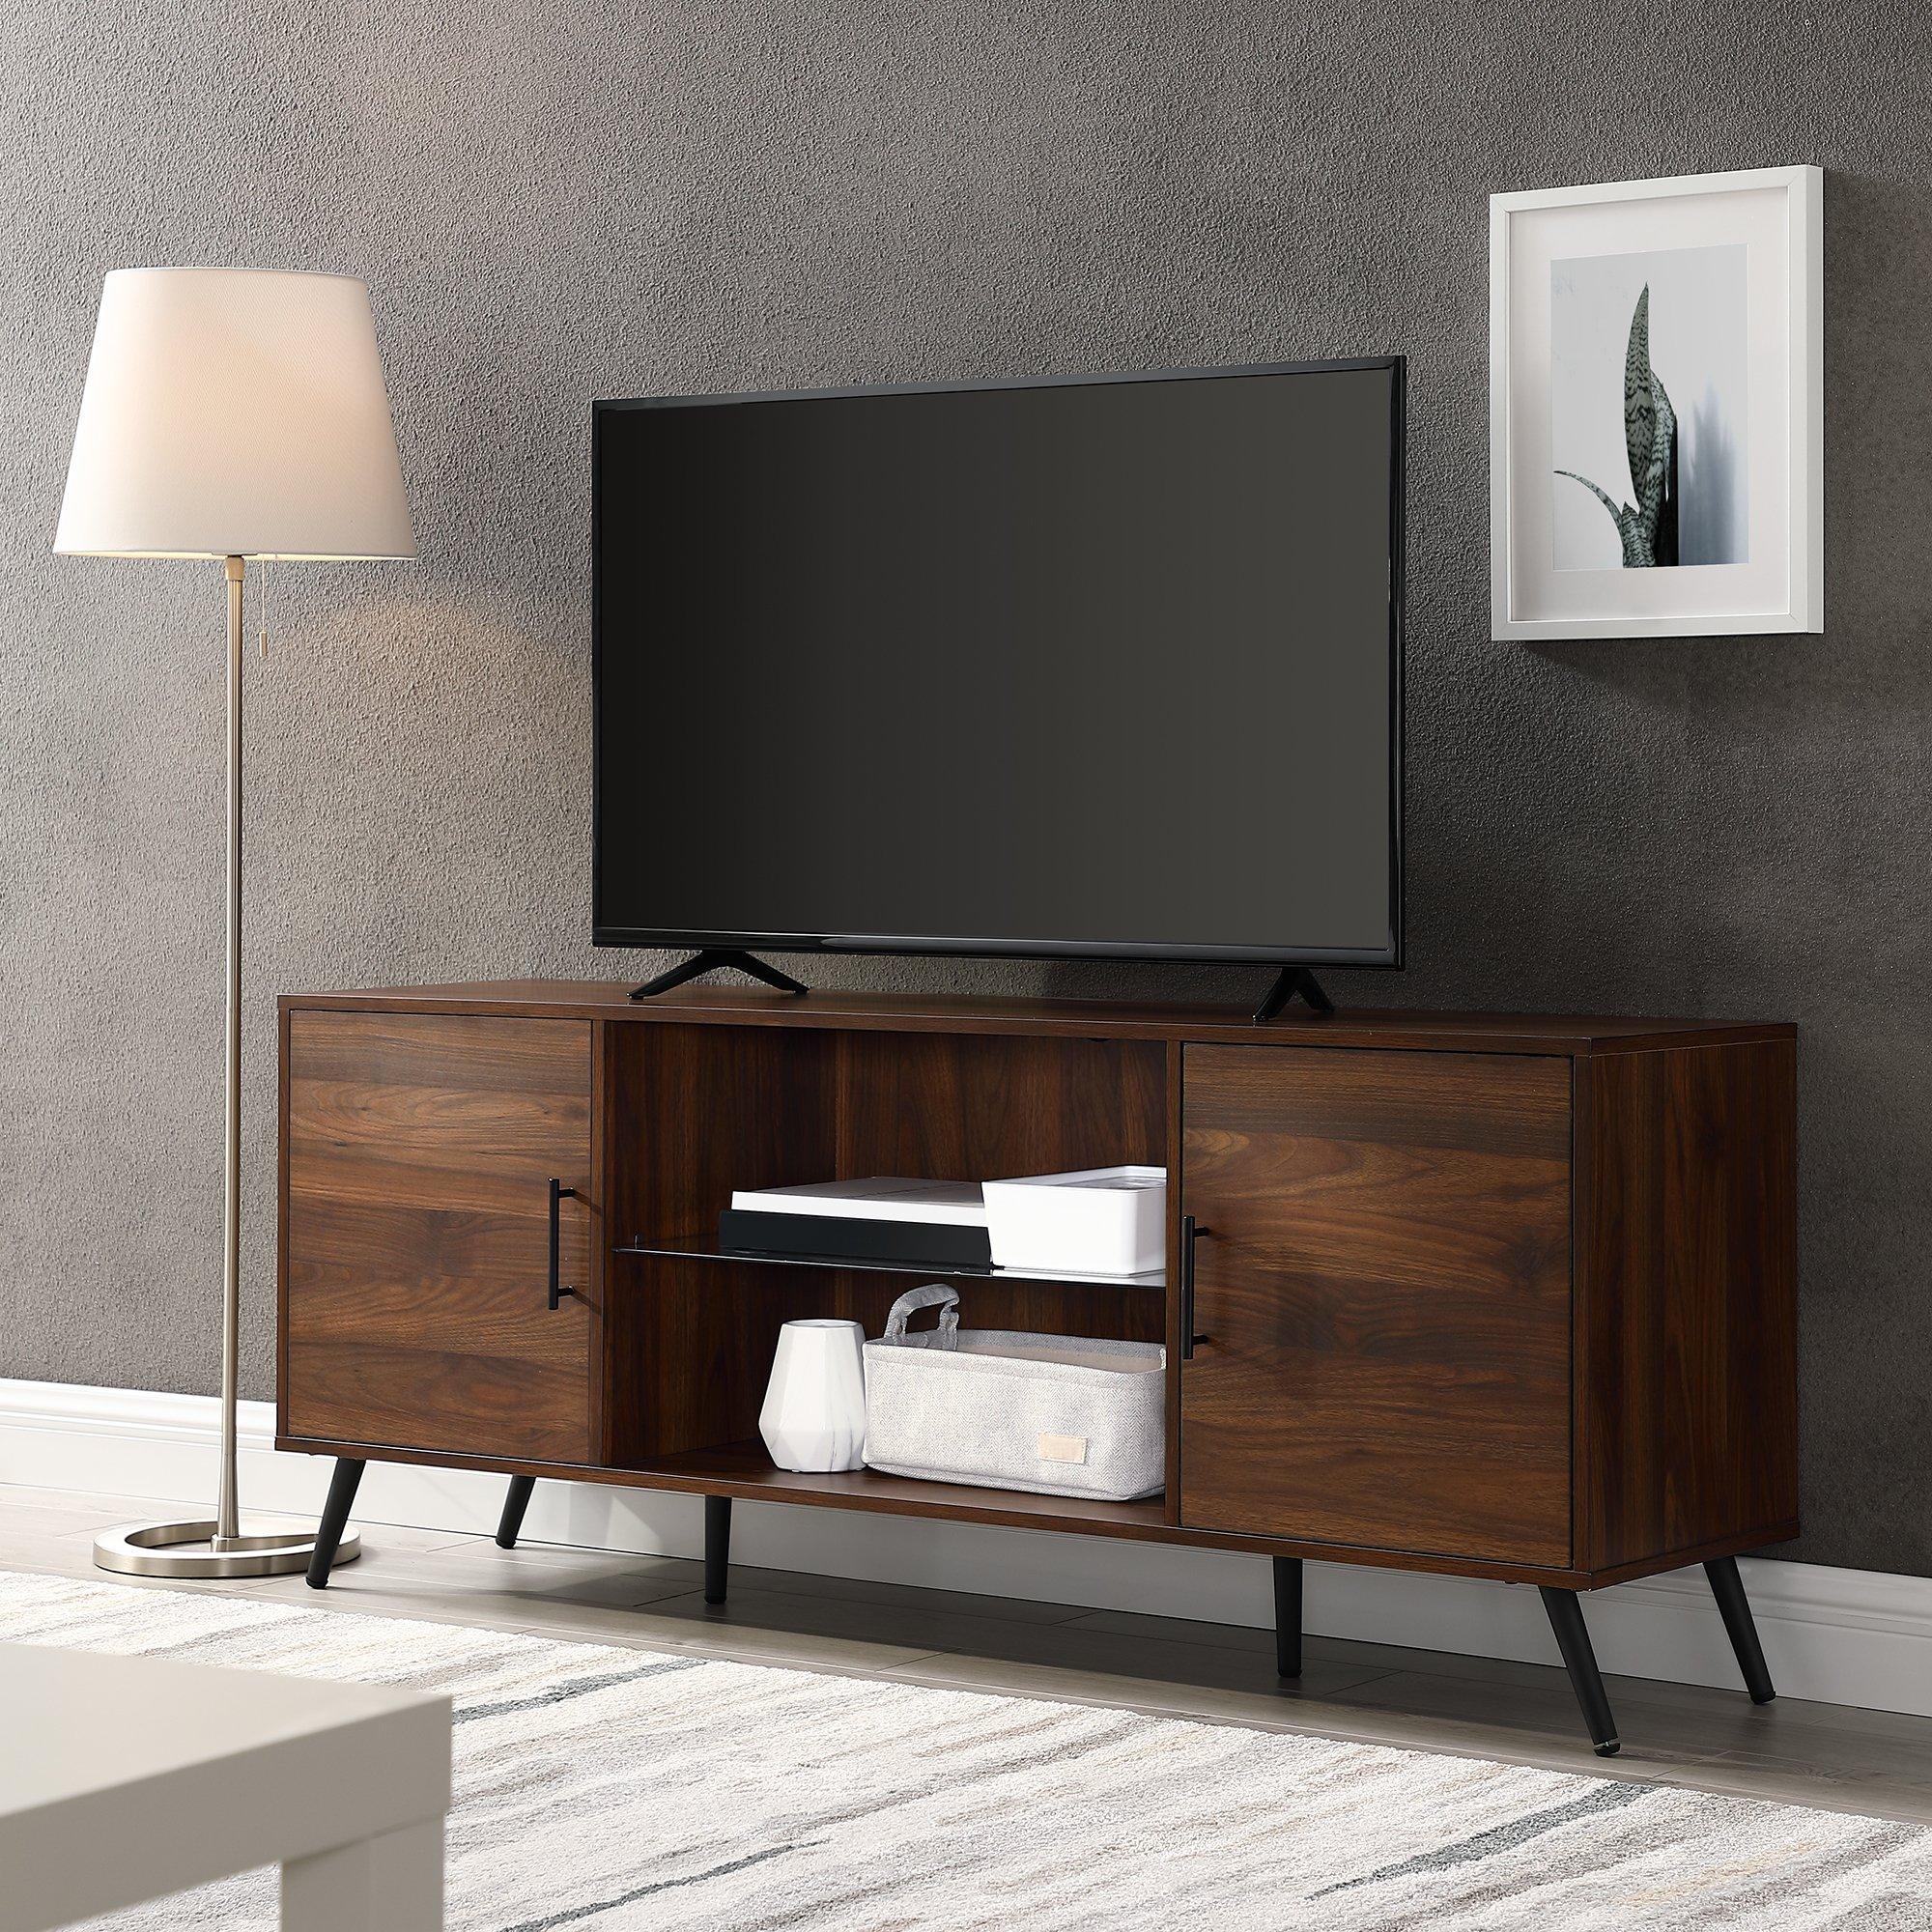 WE Furniture AZ60NOR2DDW TV Stand, 60'', Dark Walnut by WE Furniture